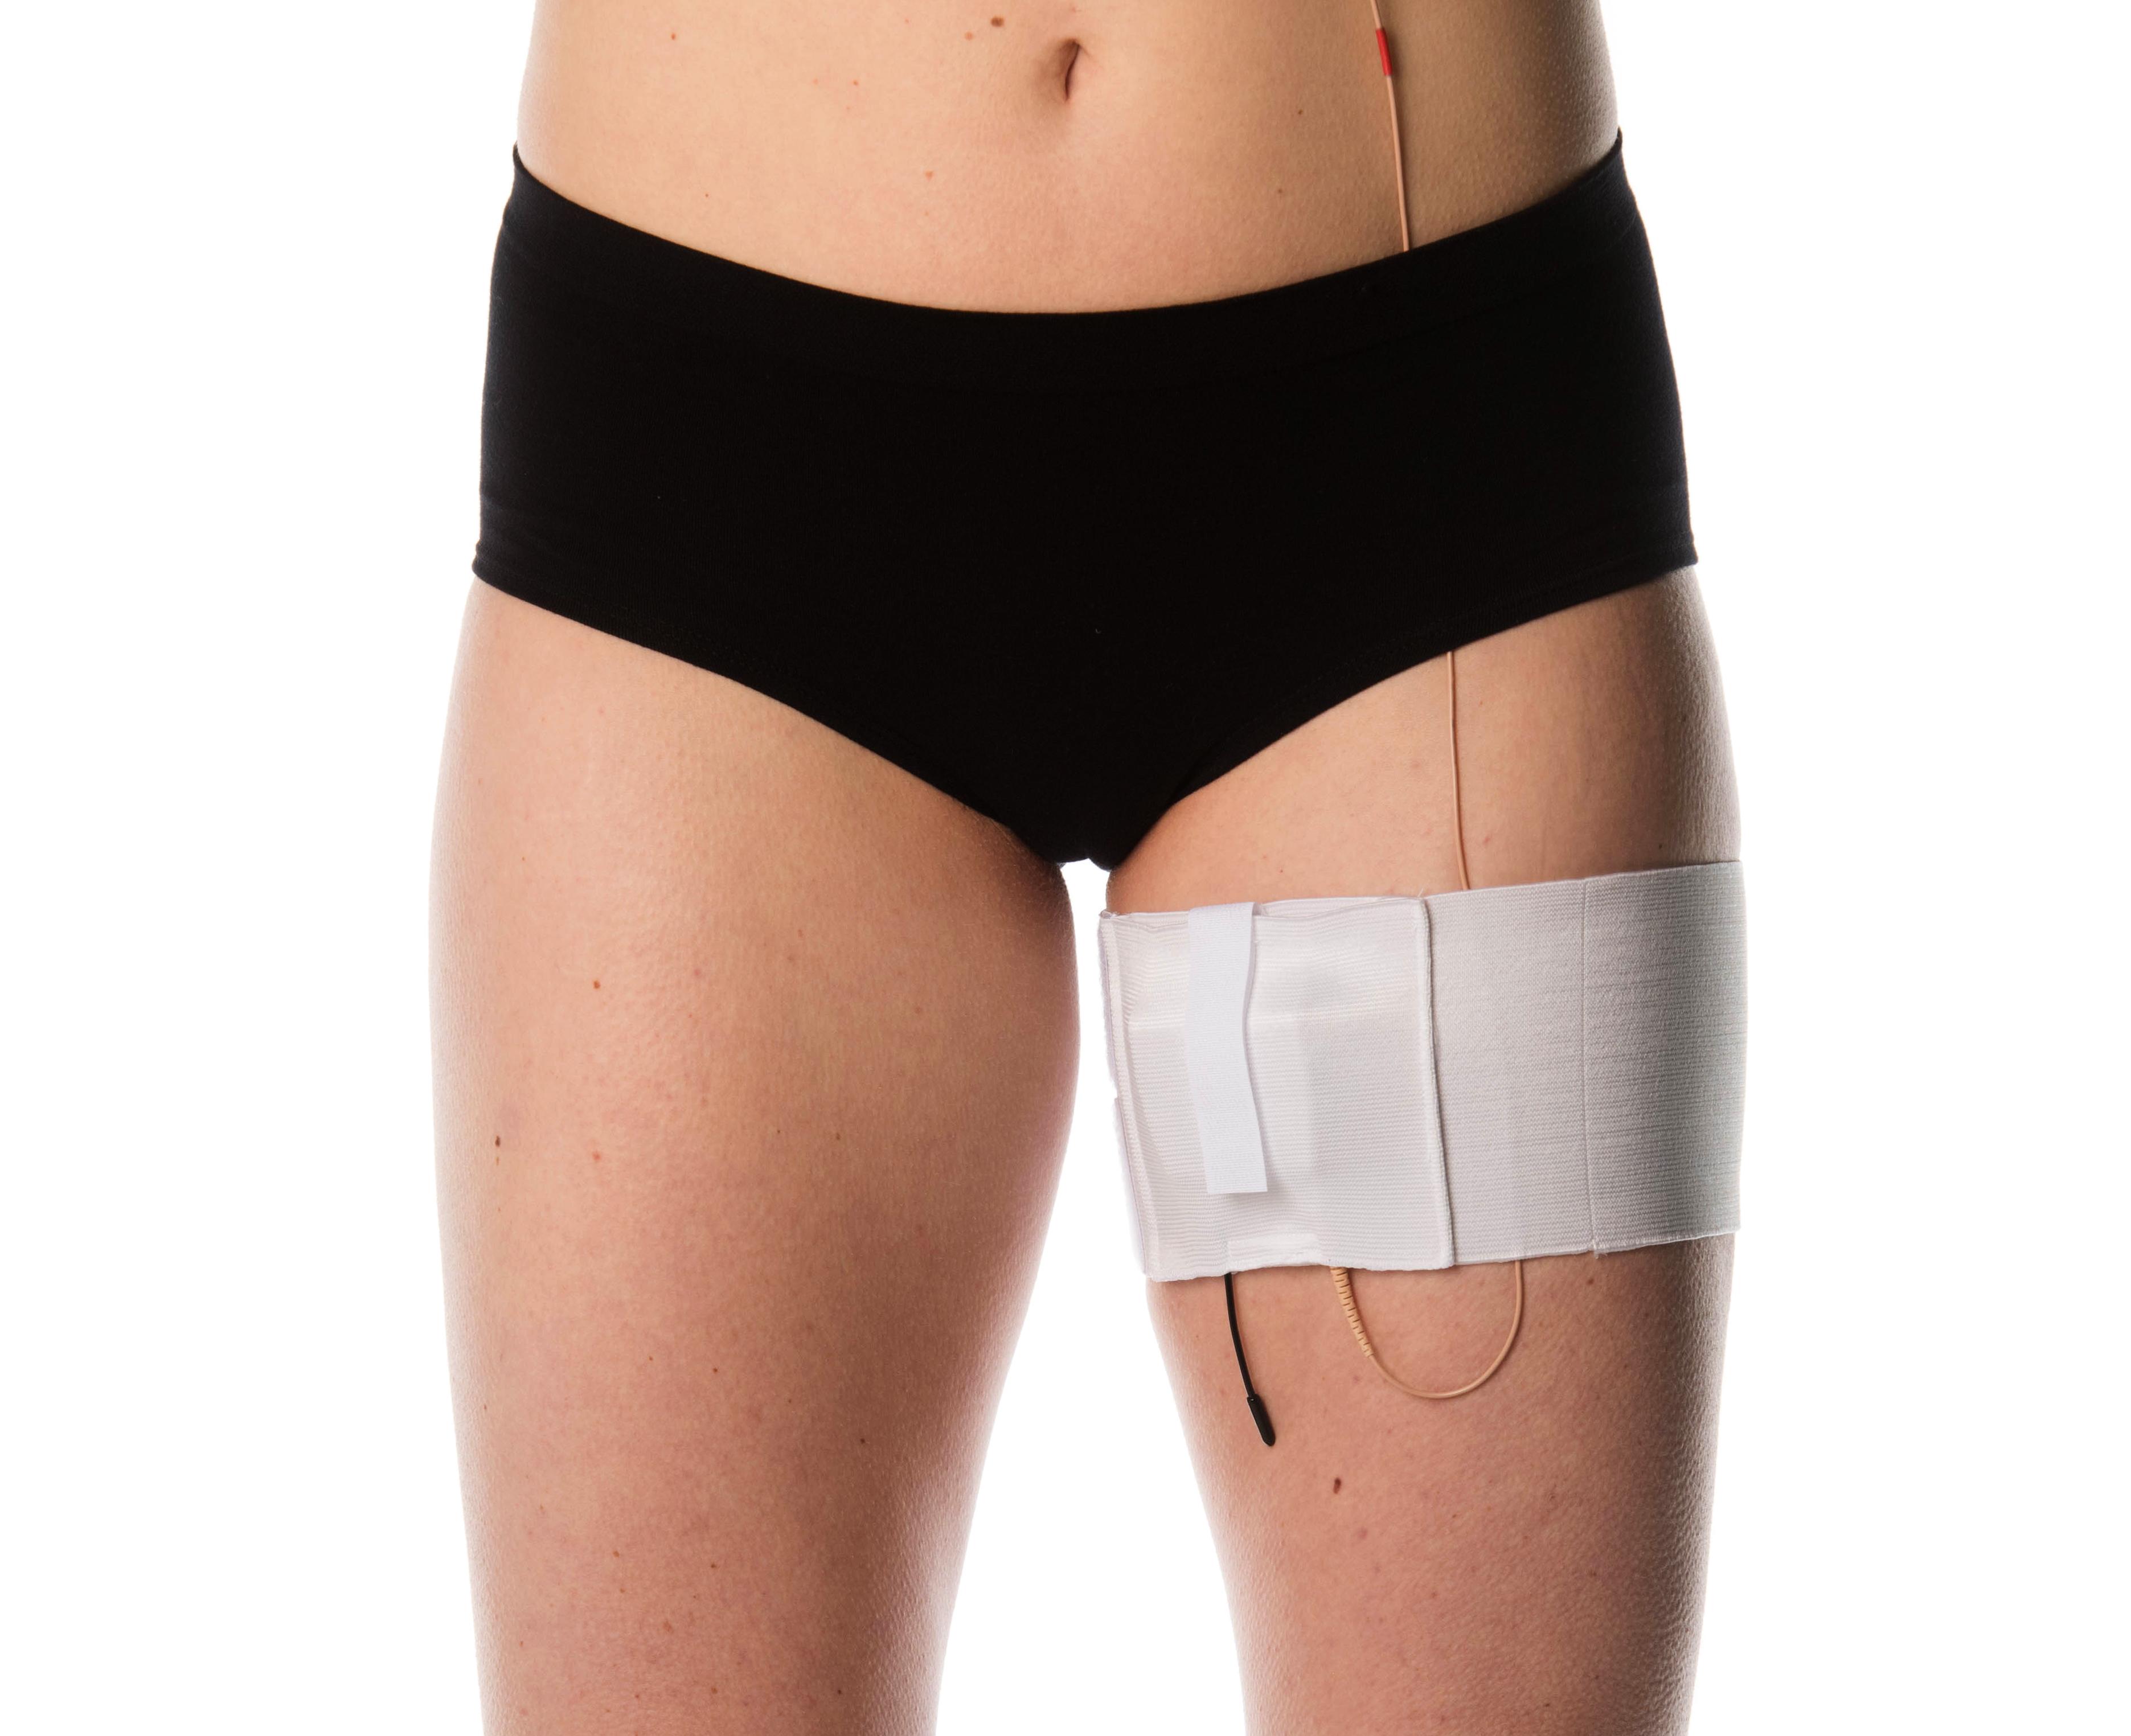 UniBelt thigh belt